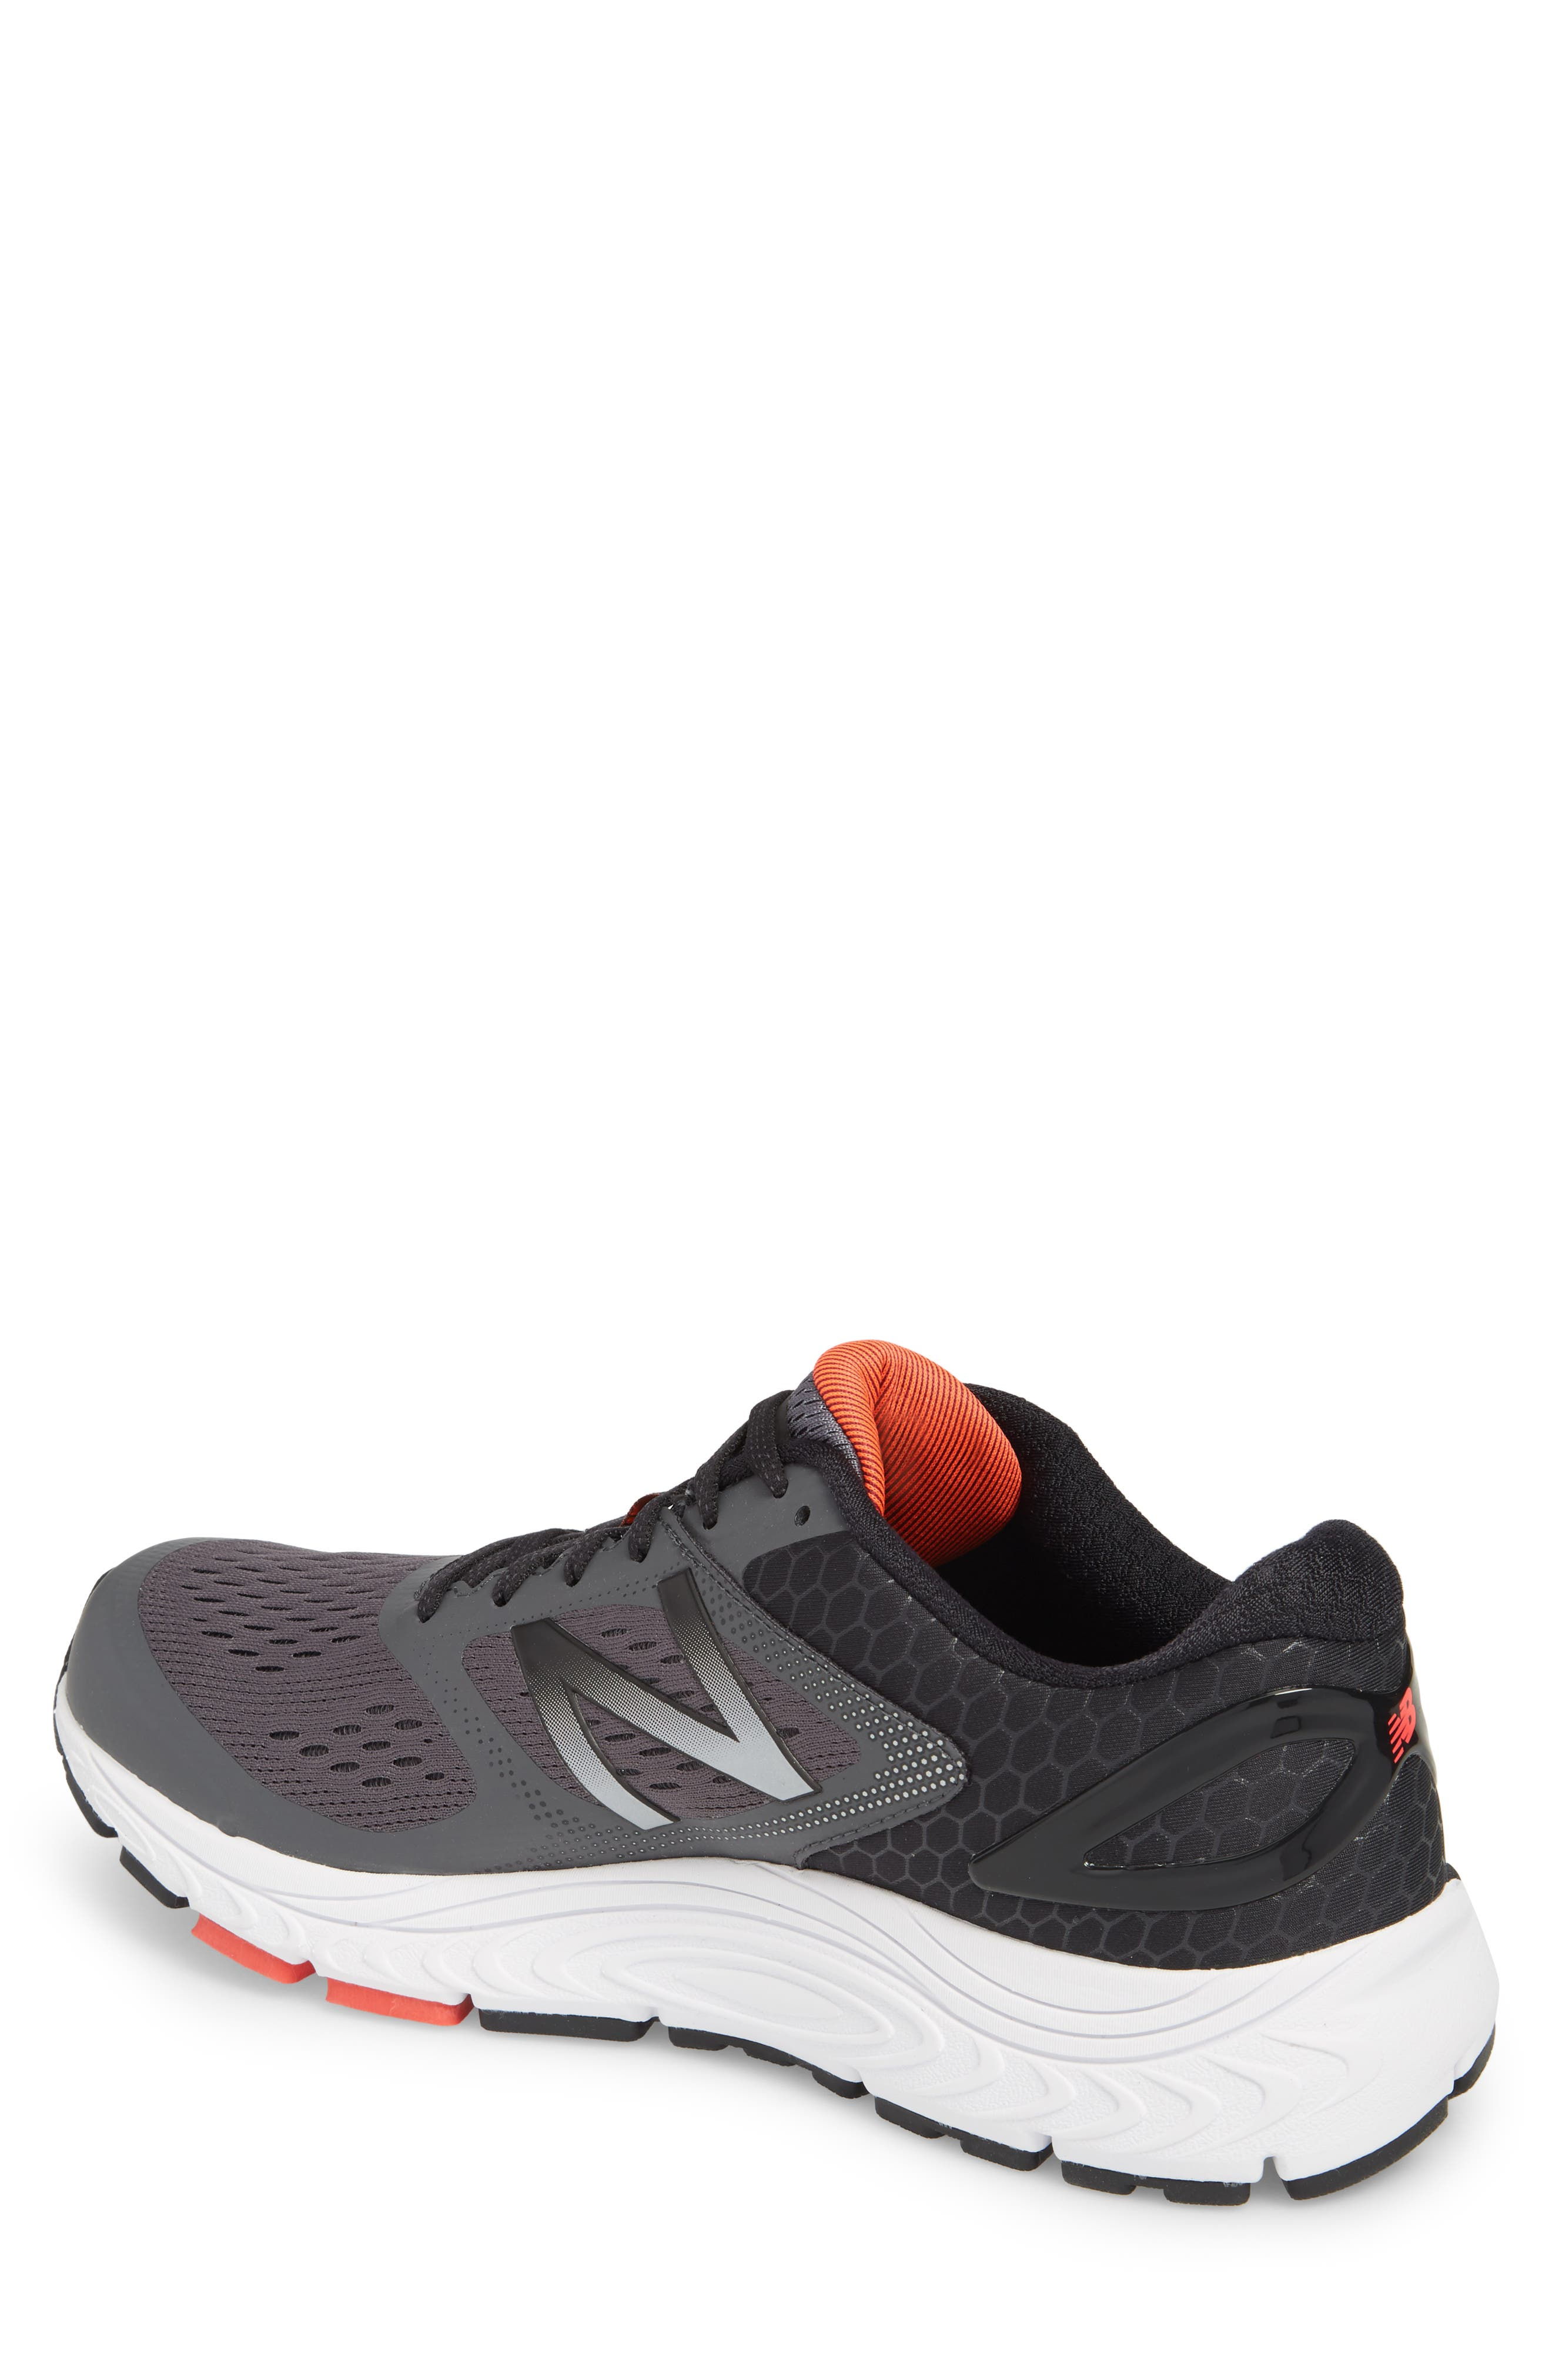 840v4 Running Shoe,                             Alternate thumbnail 2, color,                             Dark Grey